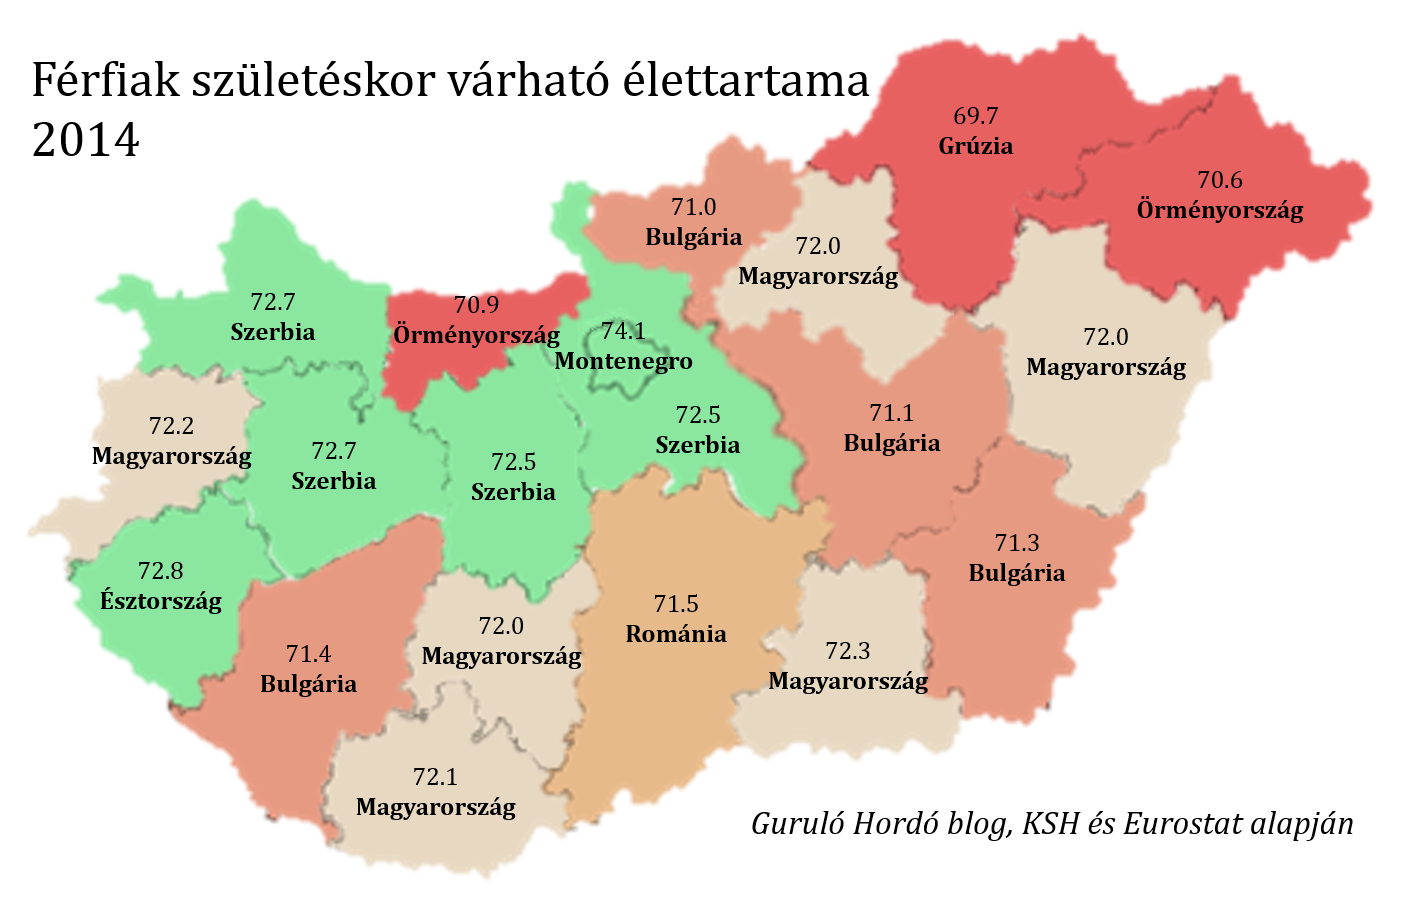 ferfiak_szuleteskor_varhato_elettartama.png